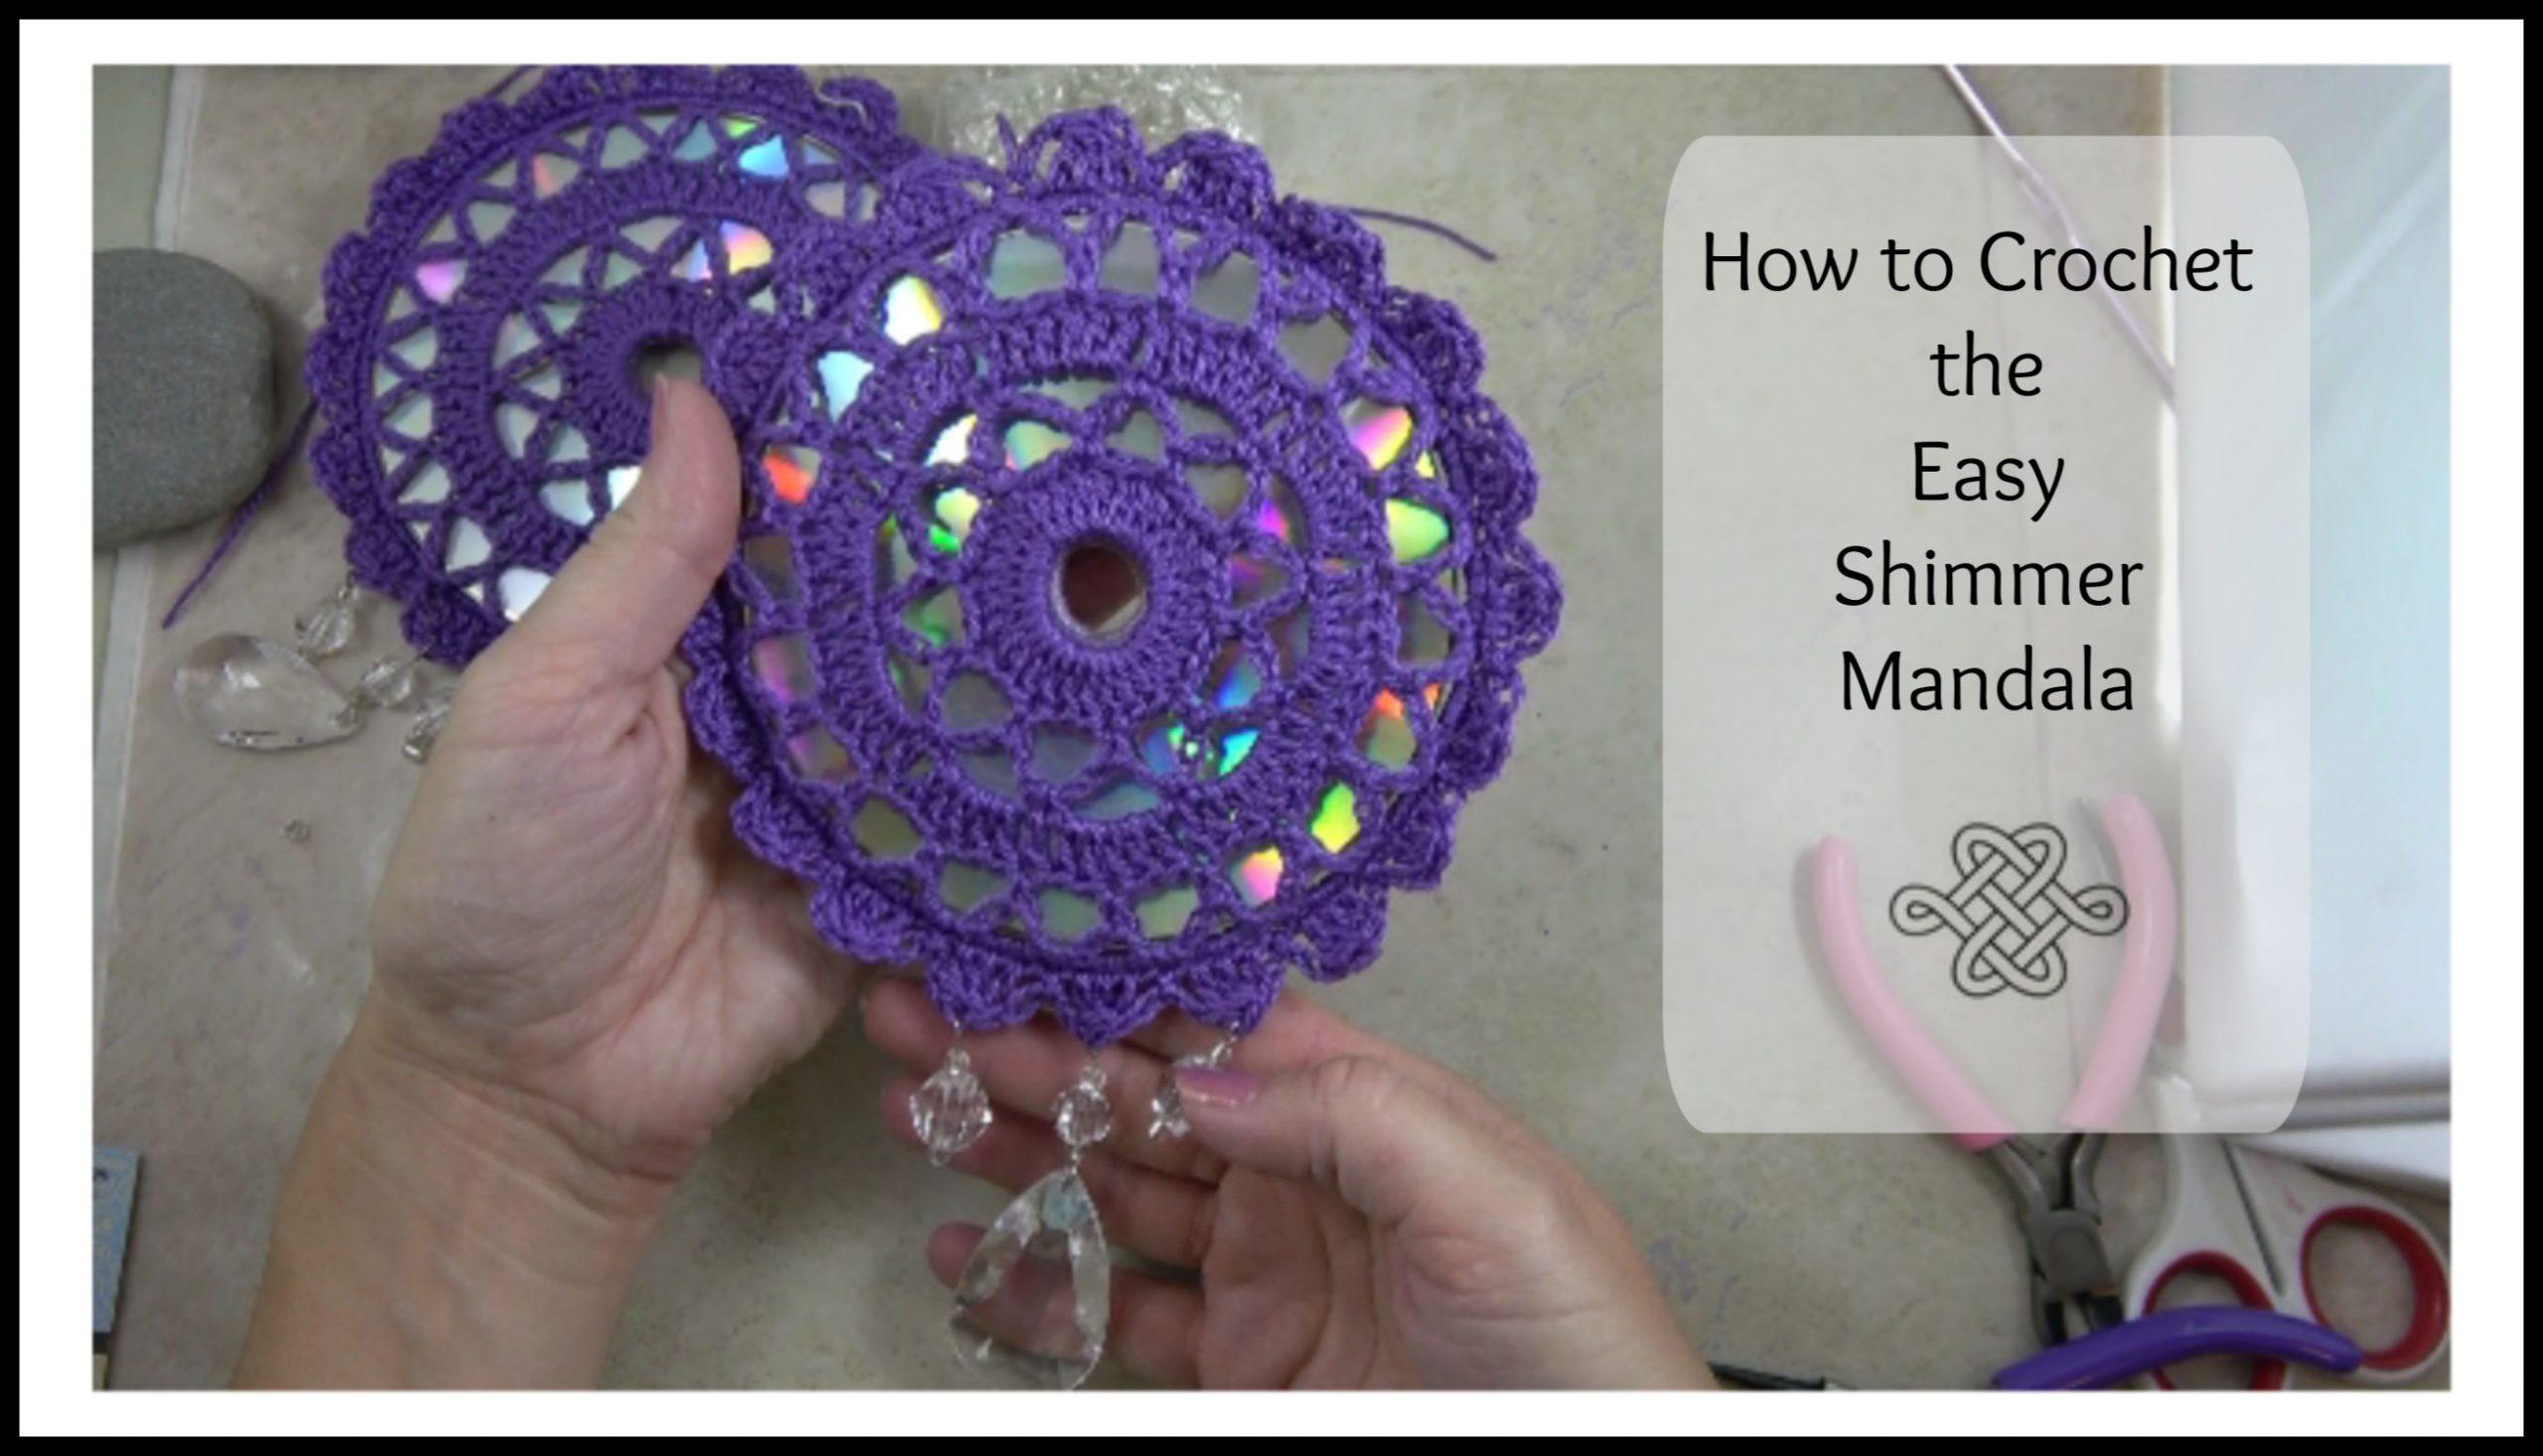 easy crochet mandala over a CD